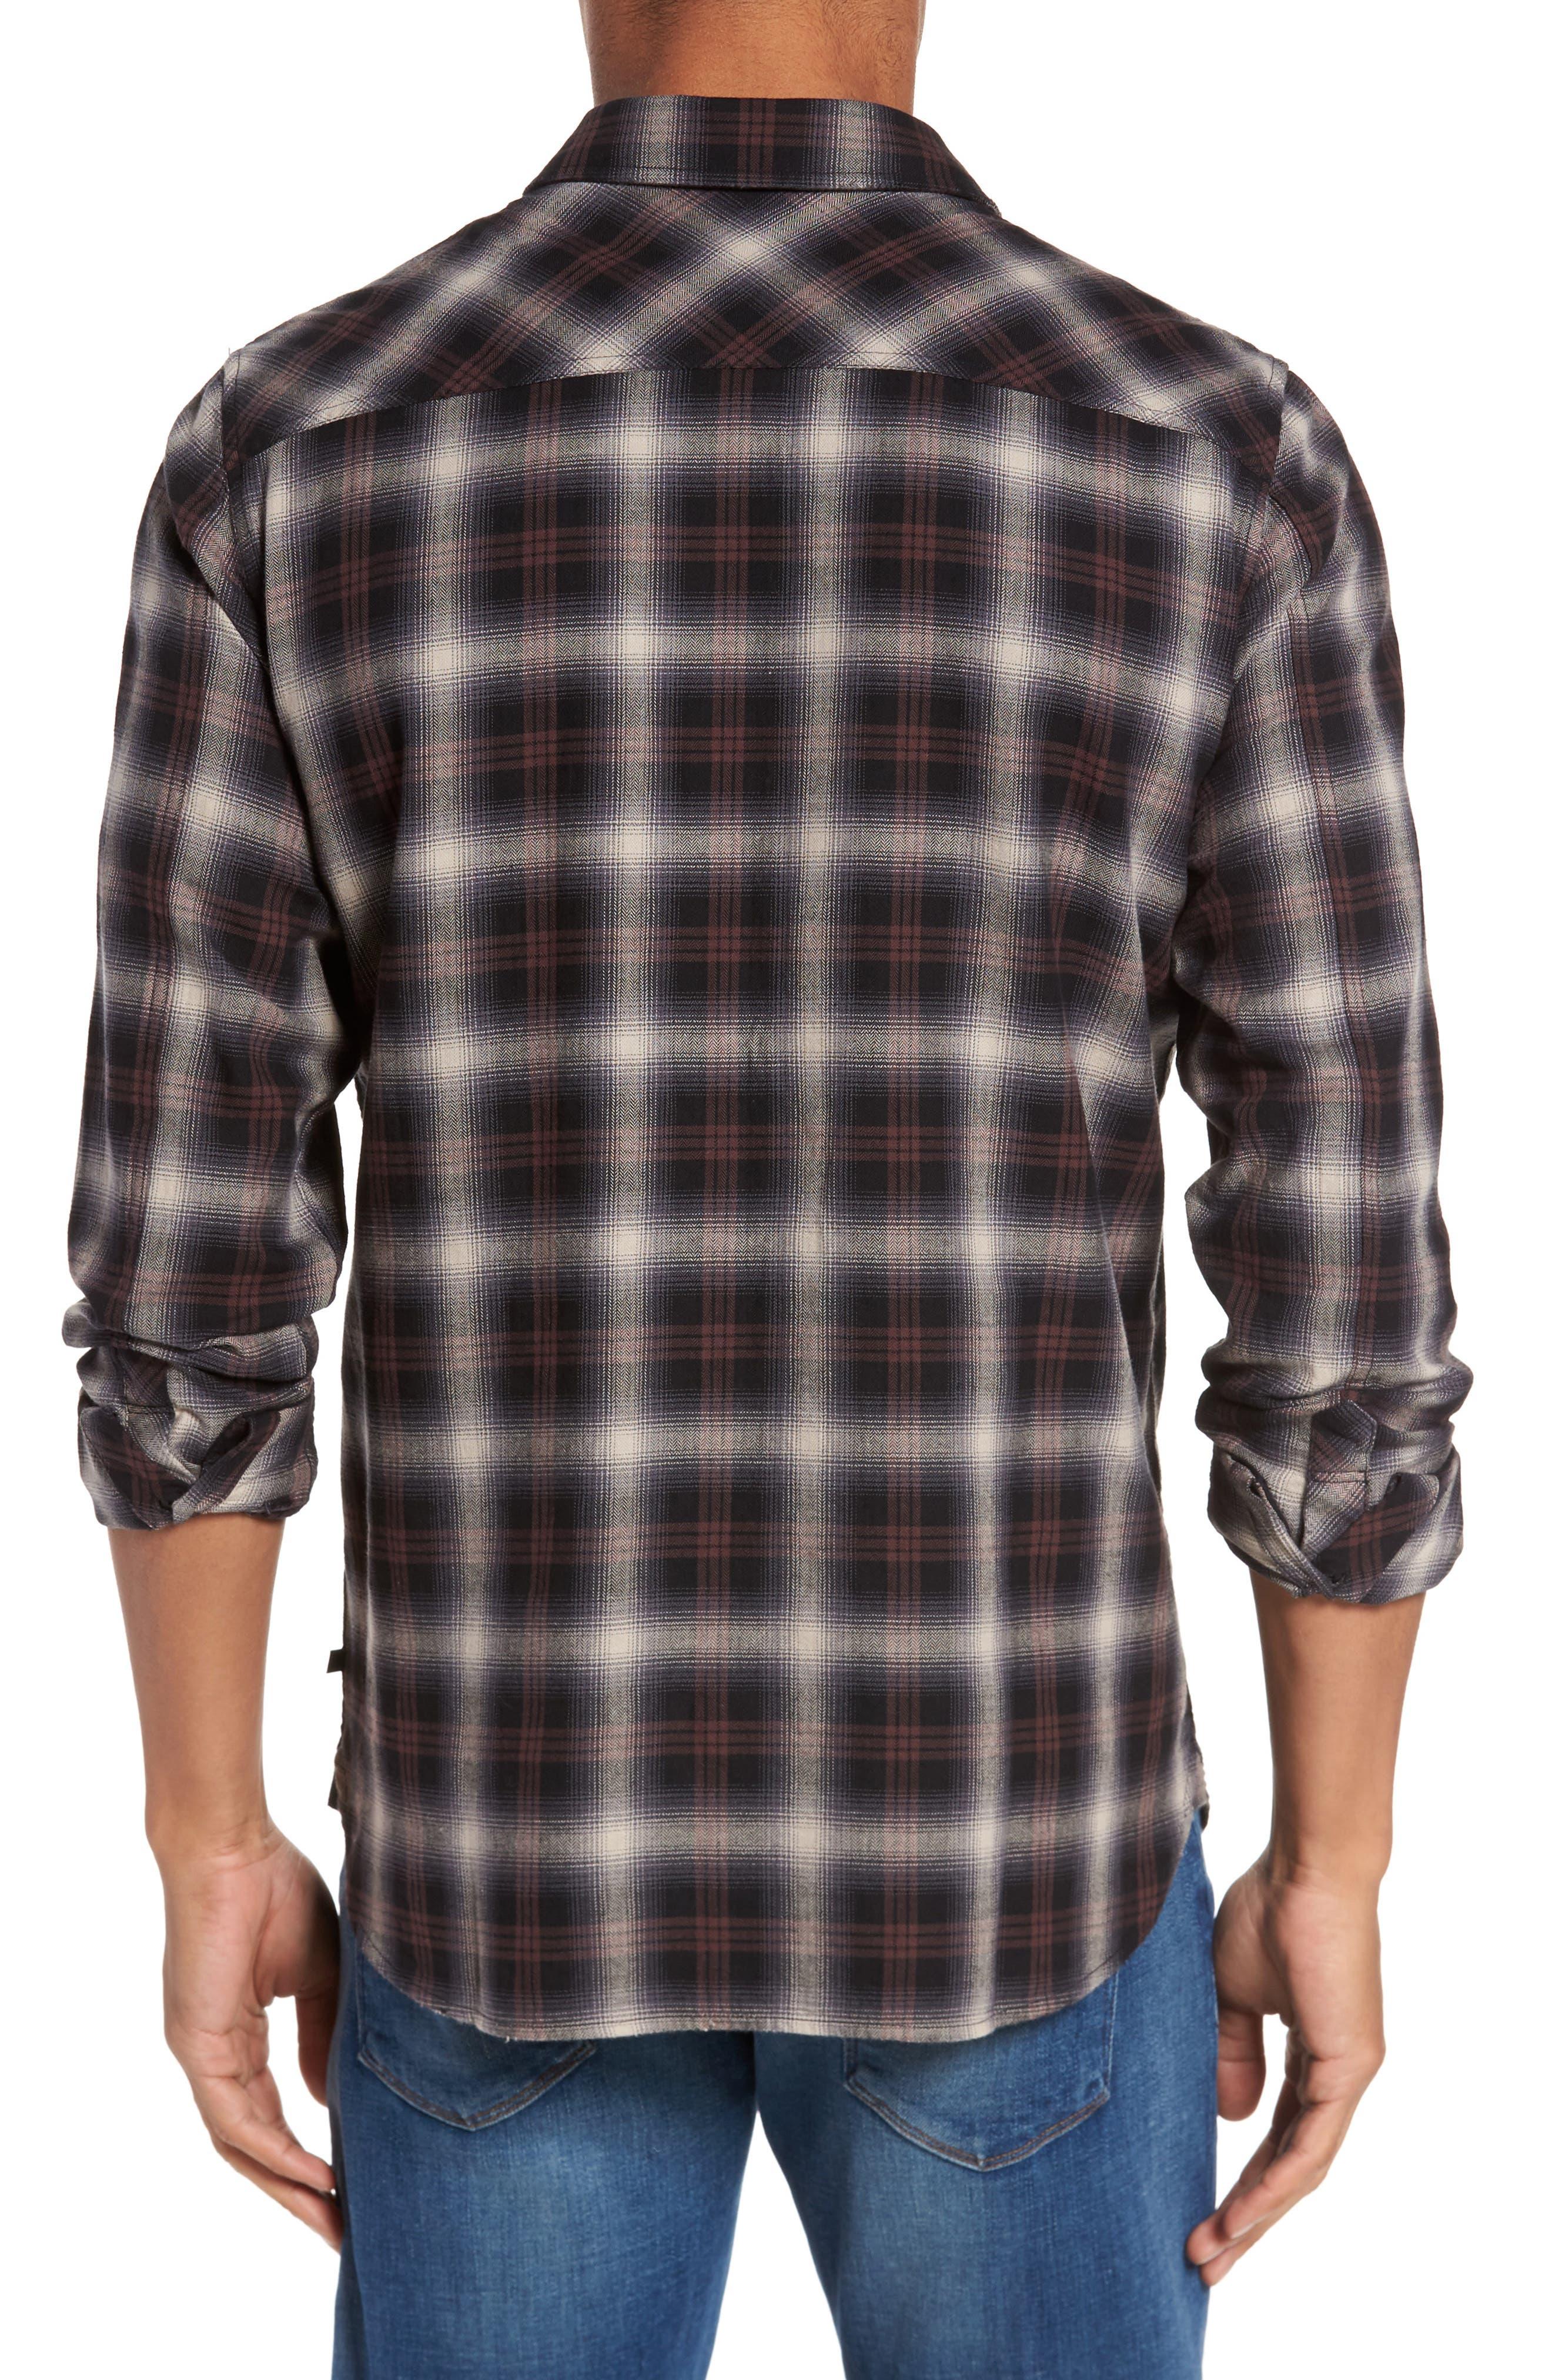 Colton Slim Fit Plaid Sport Shirt,                             Alternate thumbnail 2, color,                             7 Years Beige/ Deep Mahogany